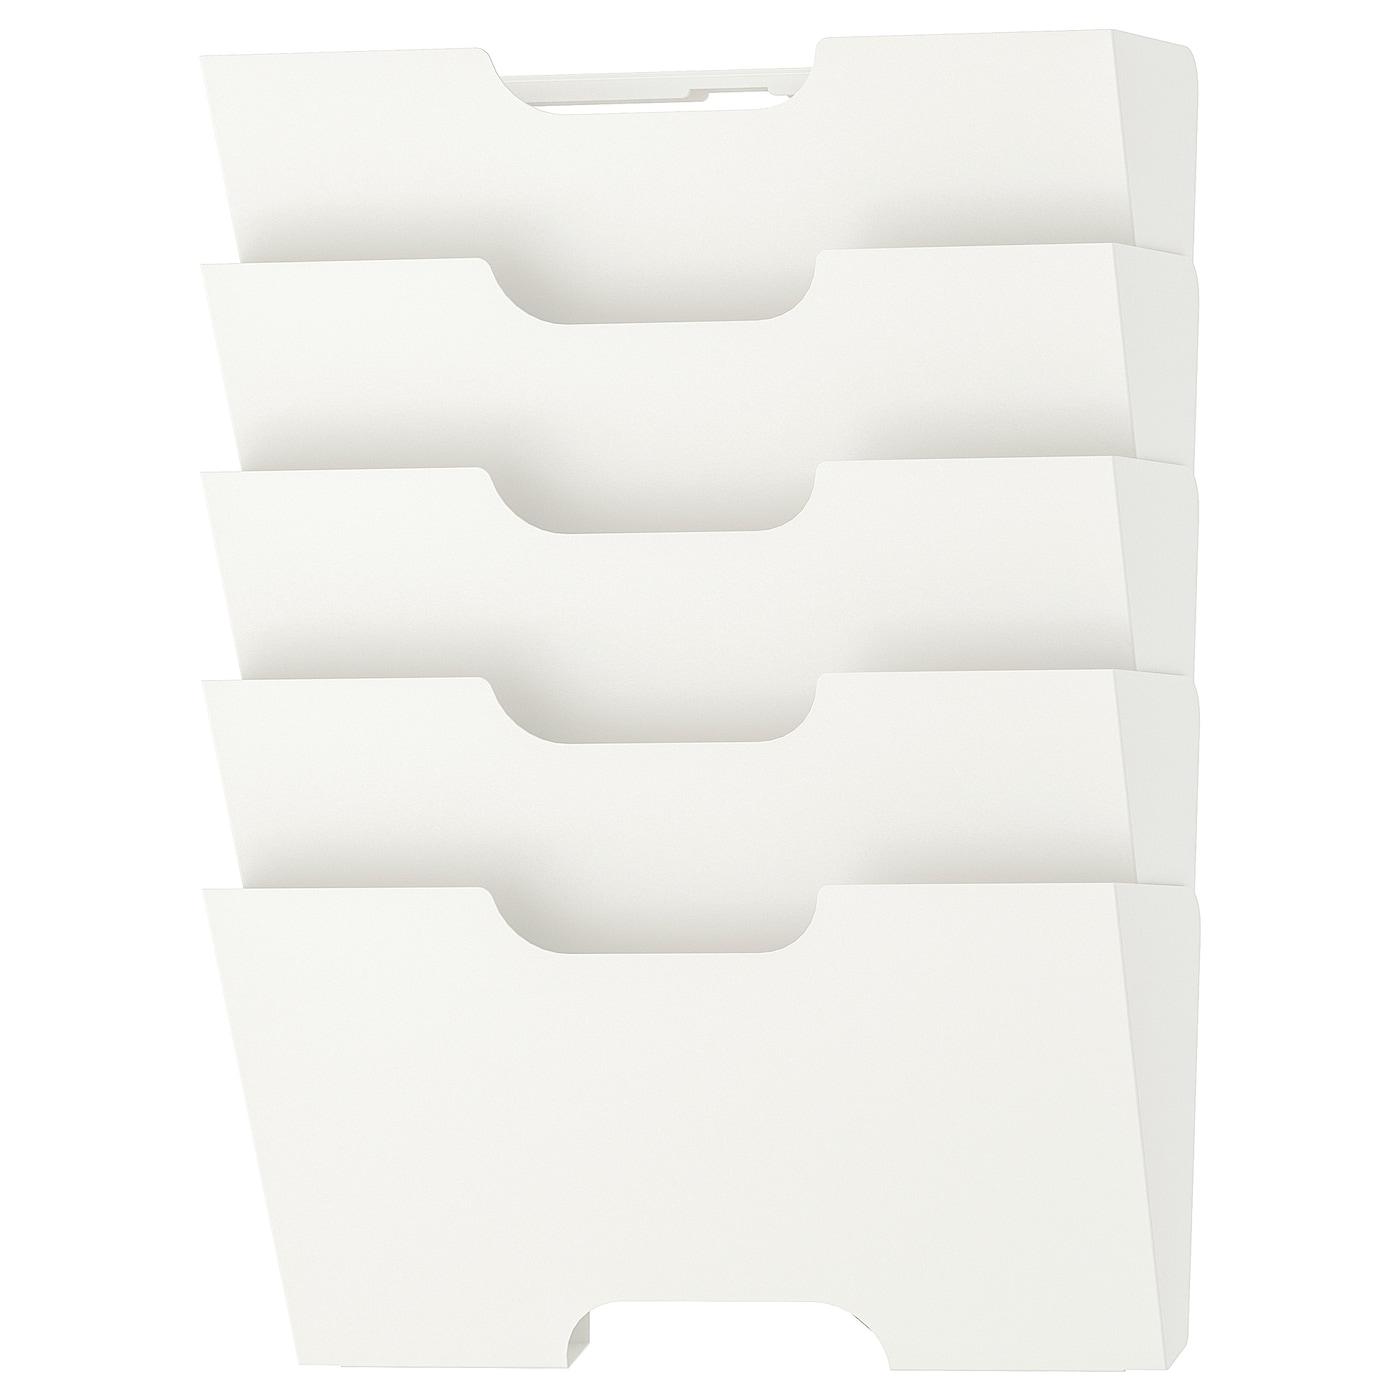 Kvissle Range Revues Mural Blanc Ikea